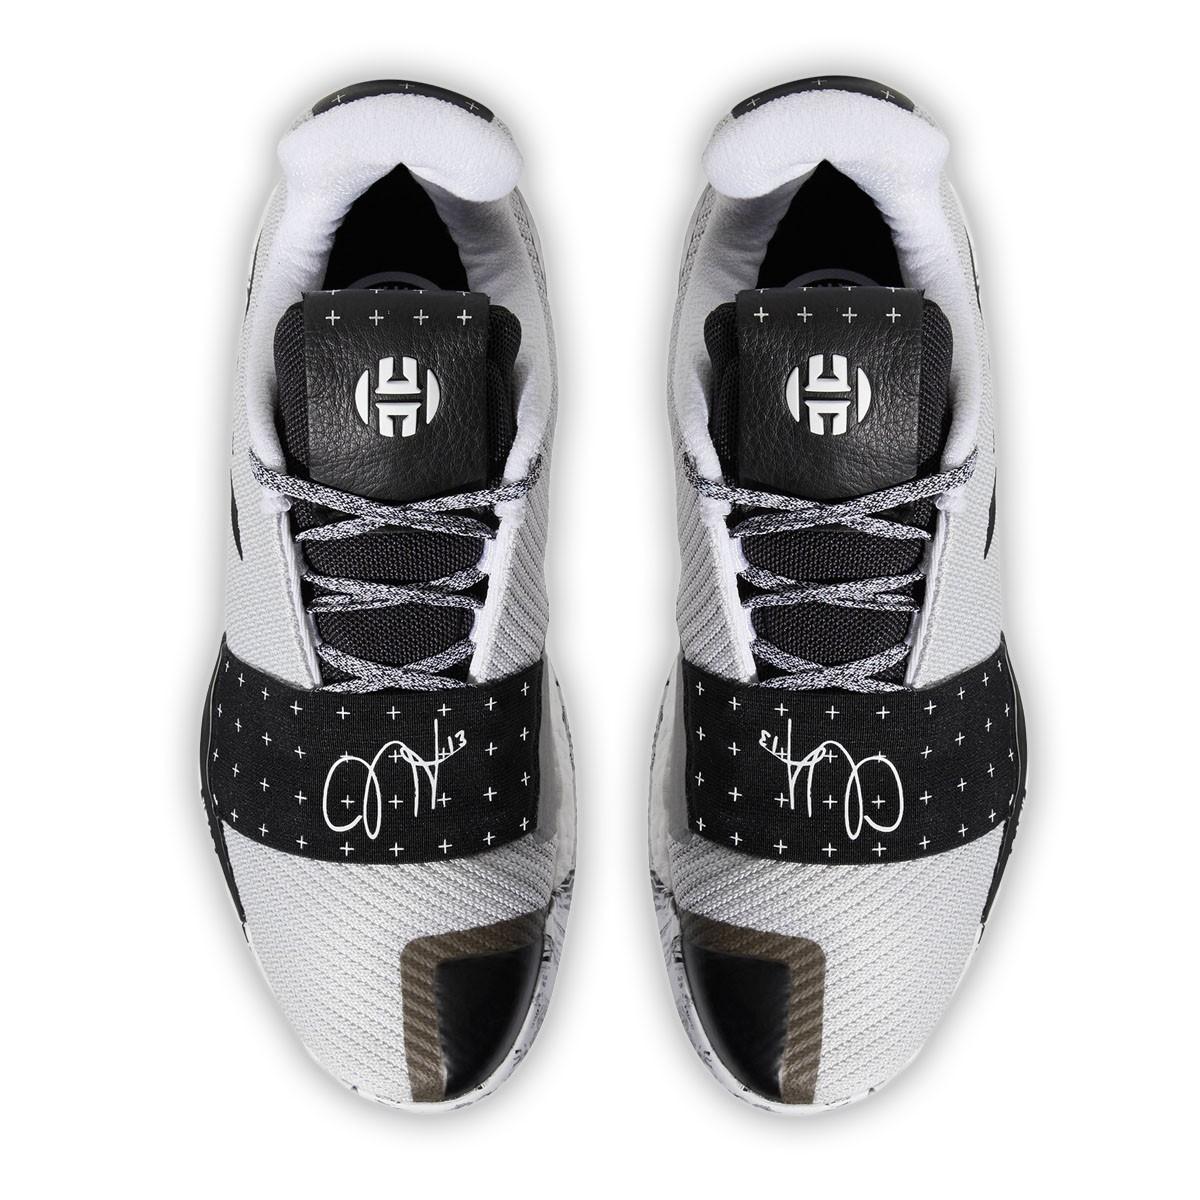 1b3c7df566ca Buy ADIDAS Harden Vol.3  Supernova  Basketball shoes   sneakers